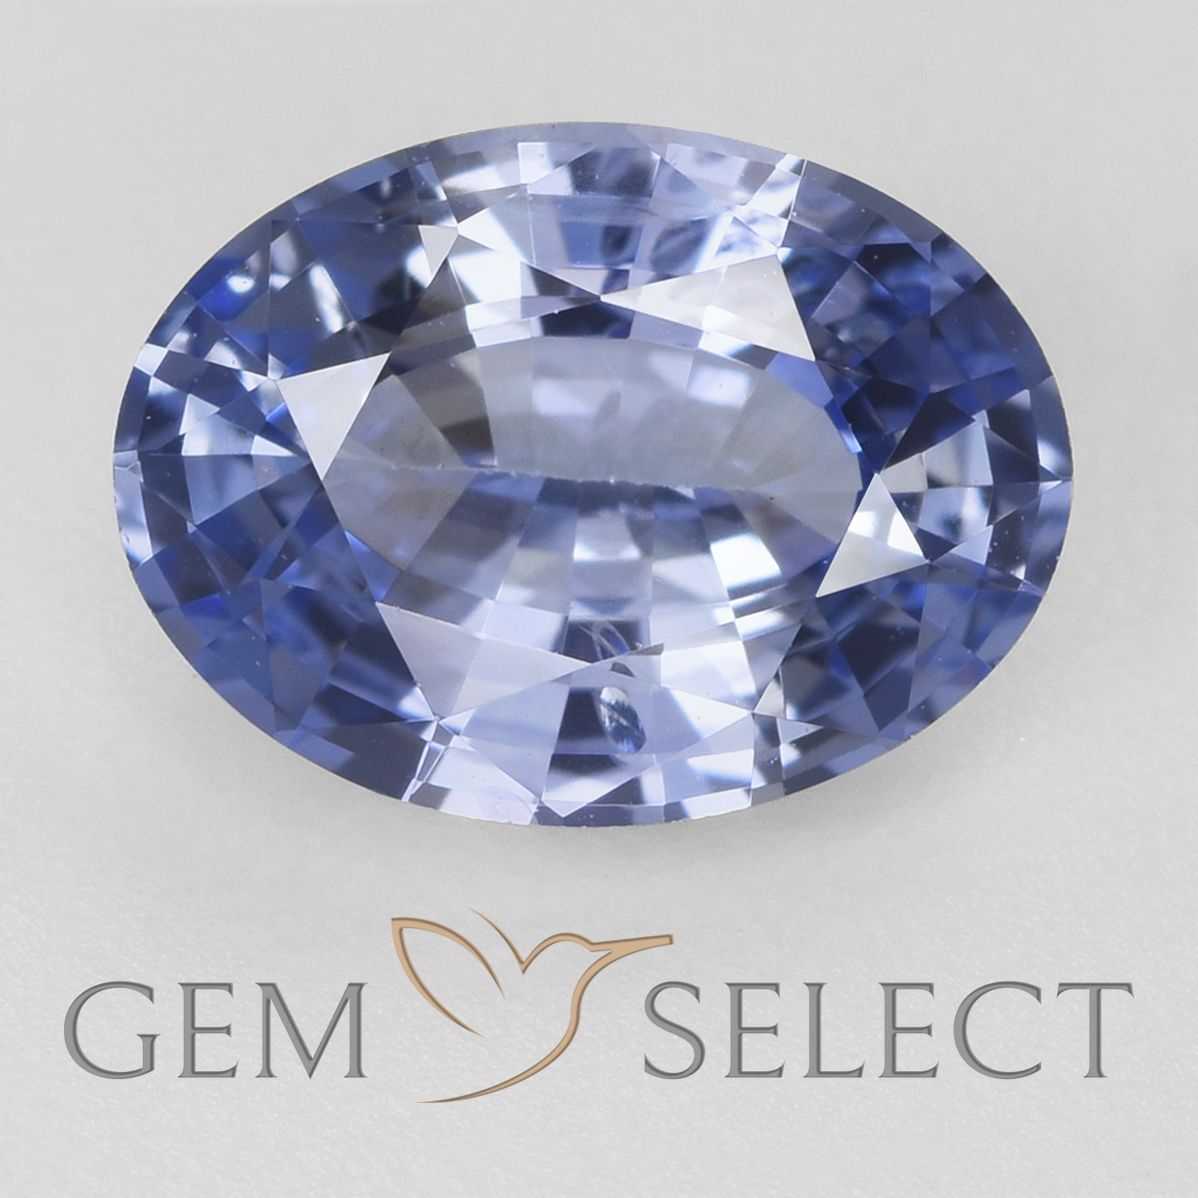 1 08 Ct Pastel Blue Sapphire Buy Gems Blue Gems Blue Sapphire